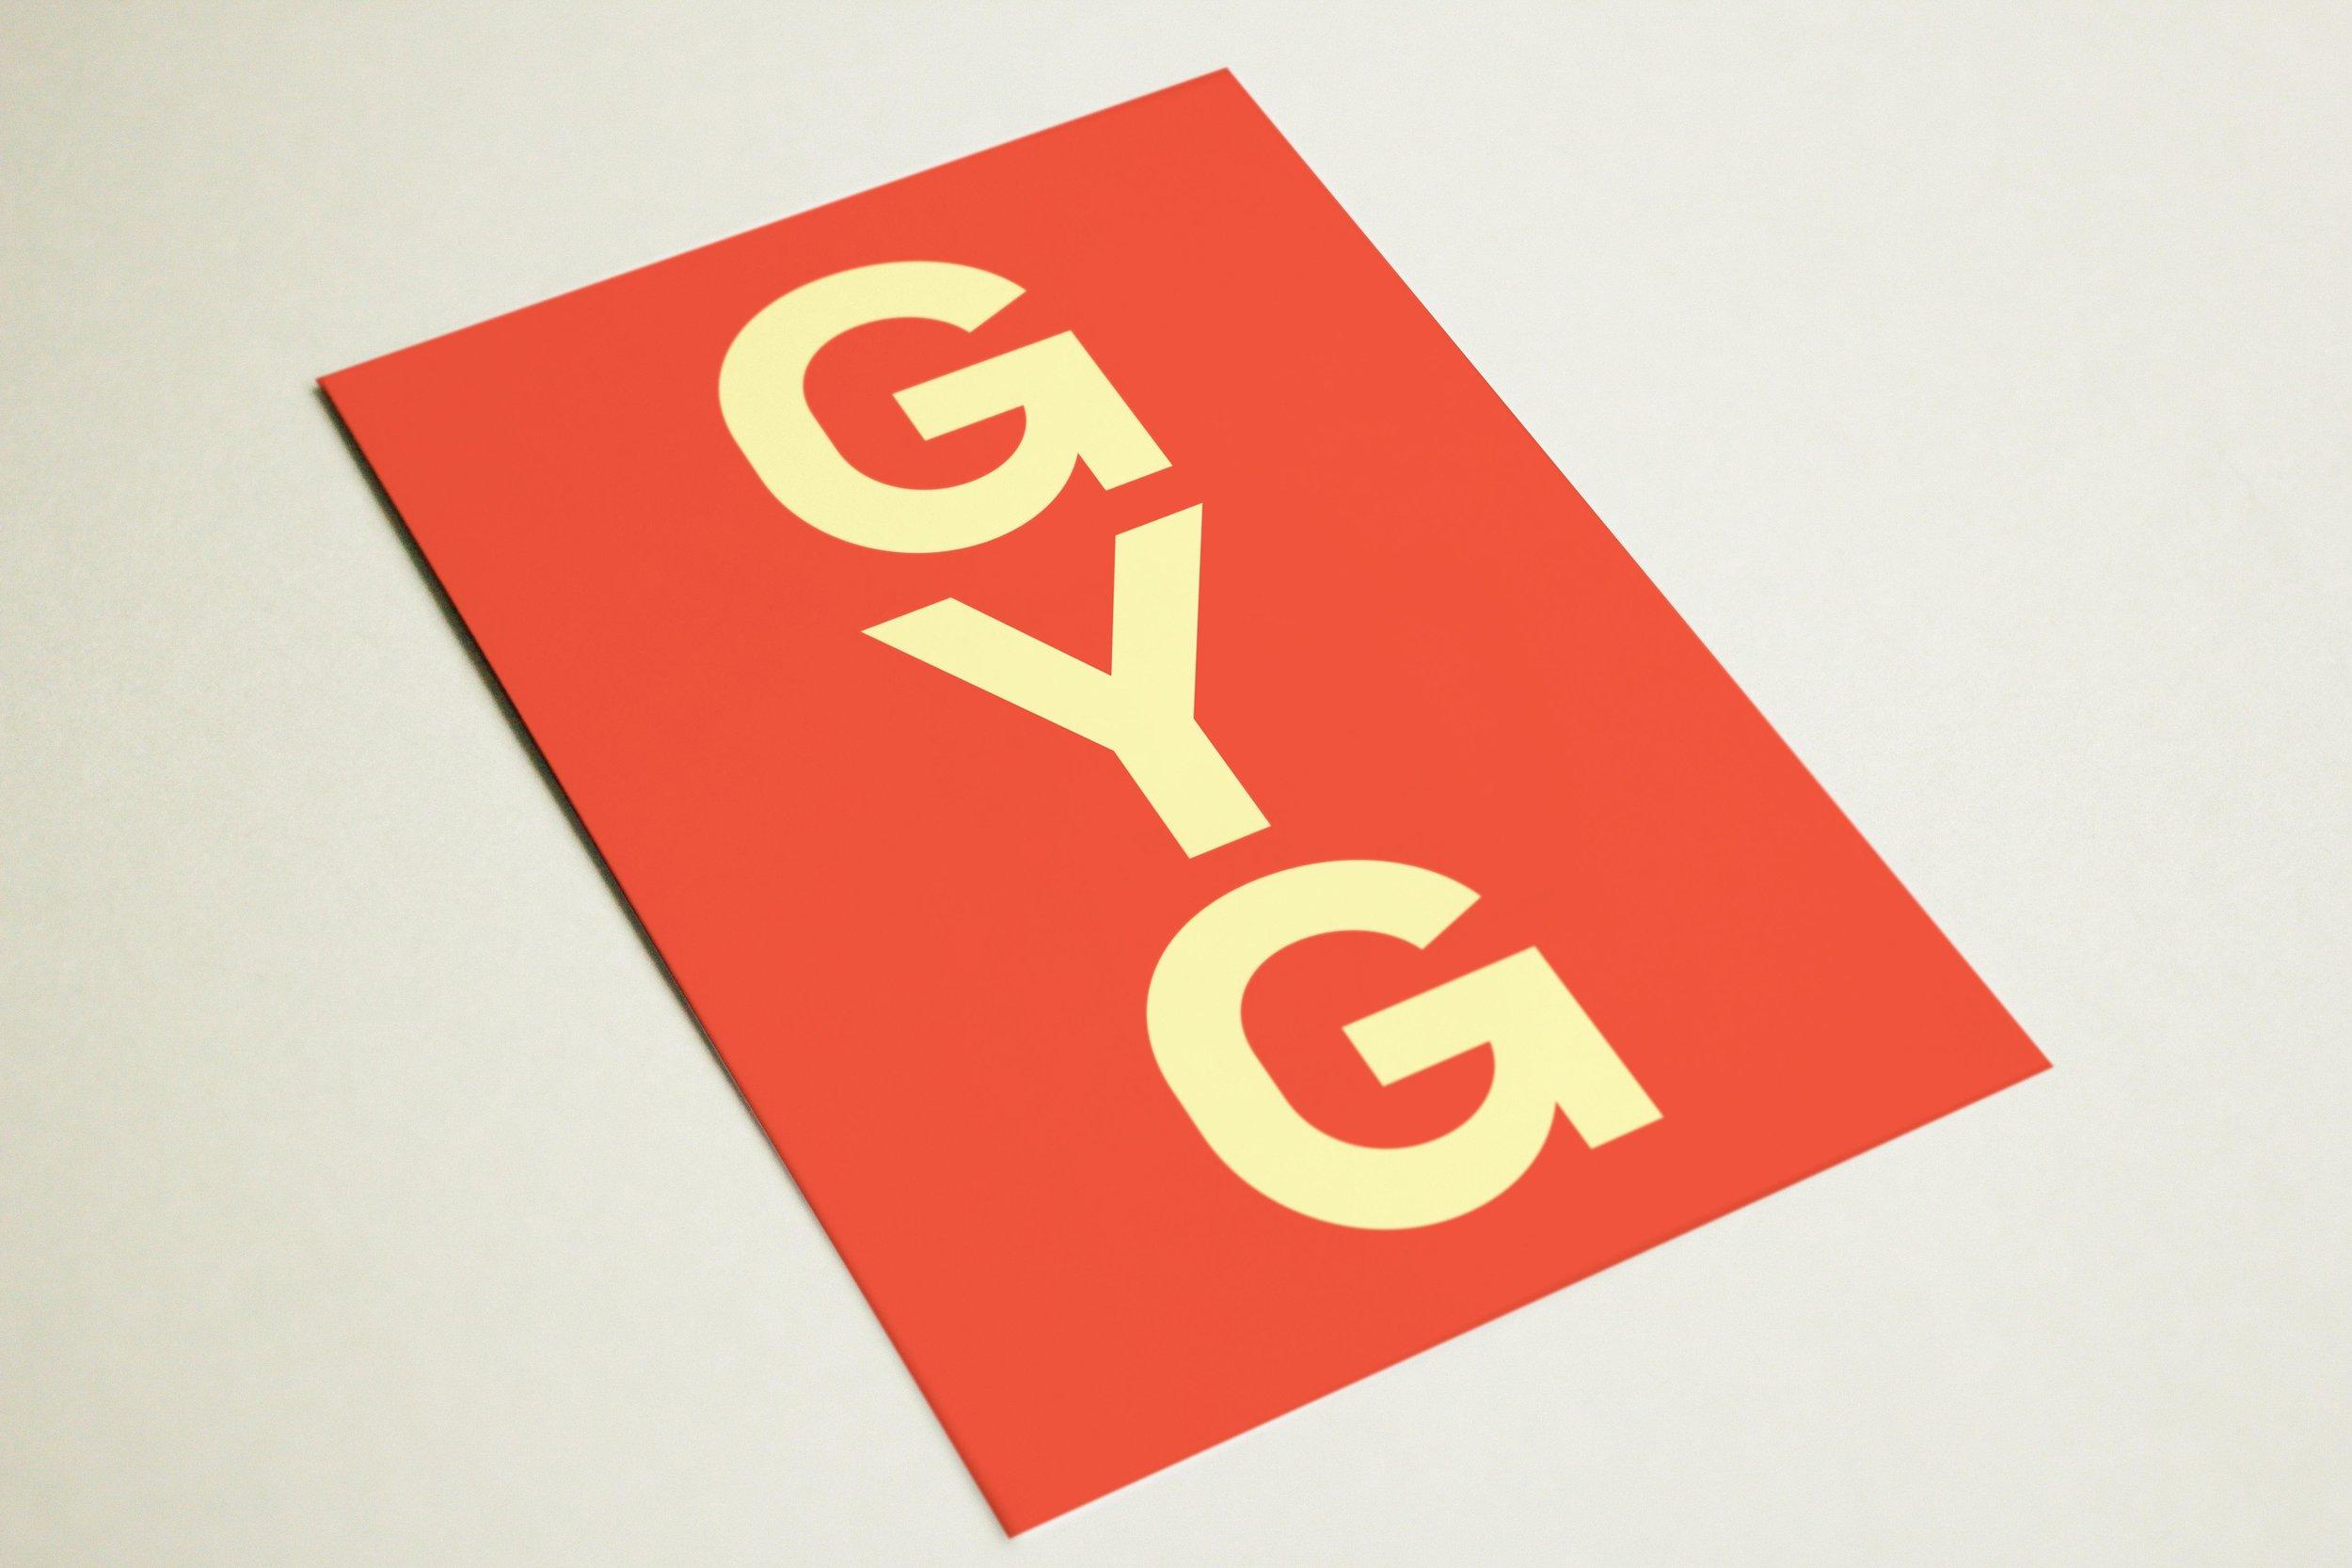 GYG_Postcard.jpg